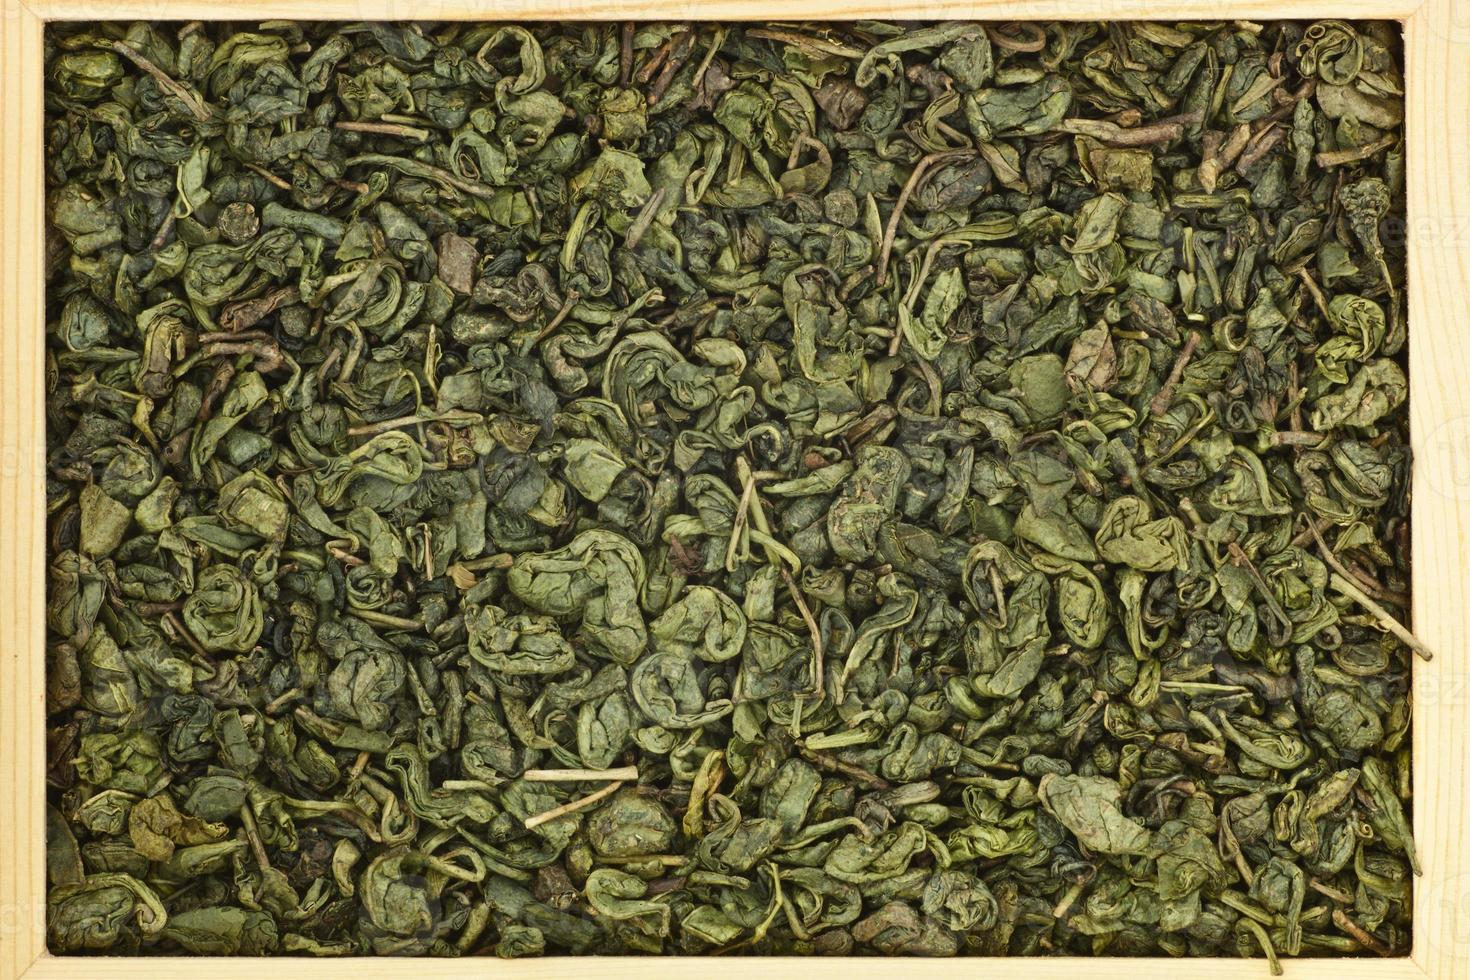 Chinese groene thee foto